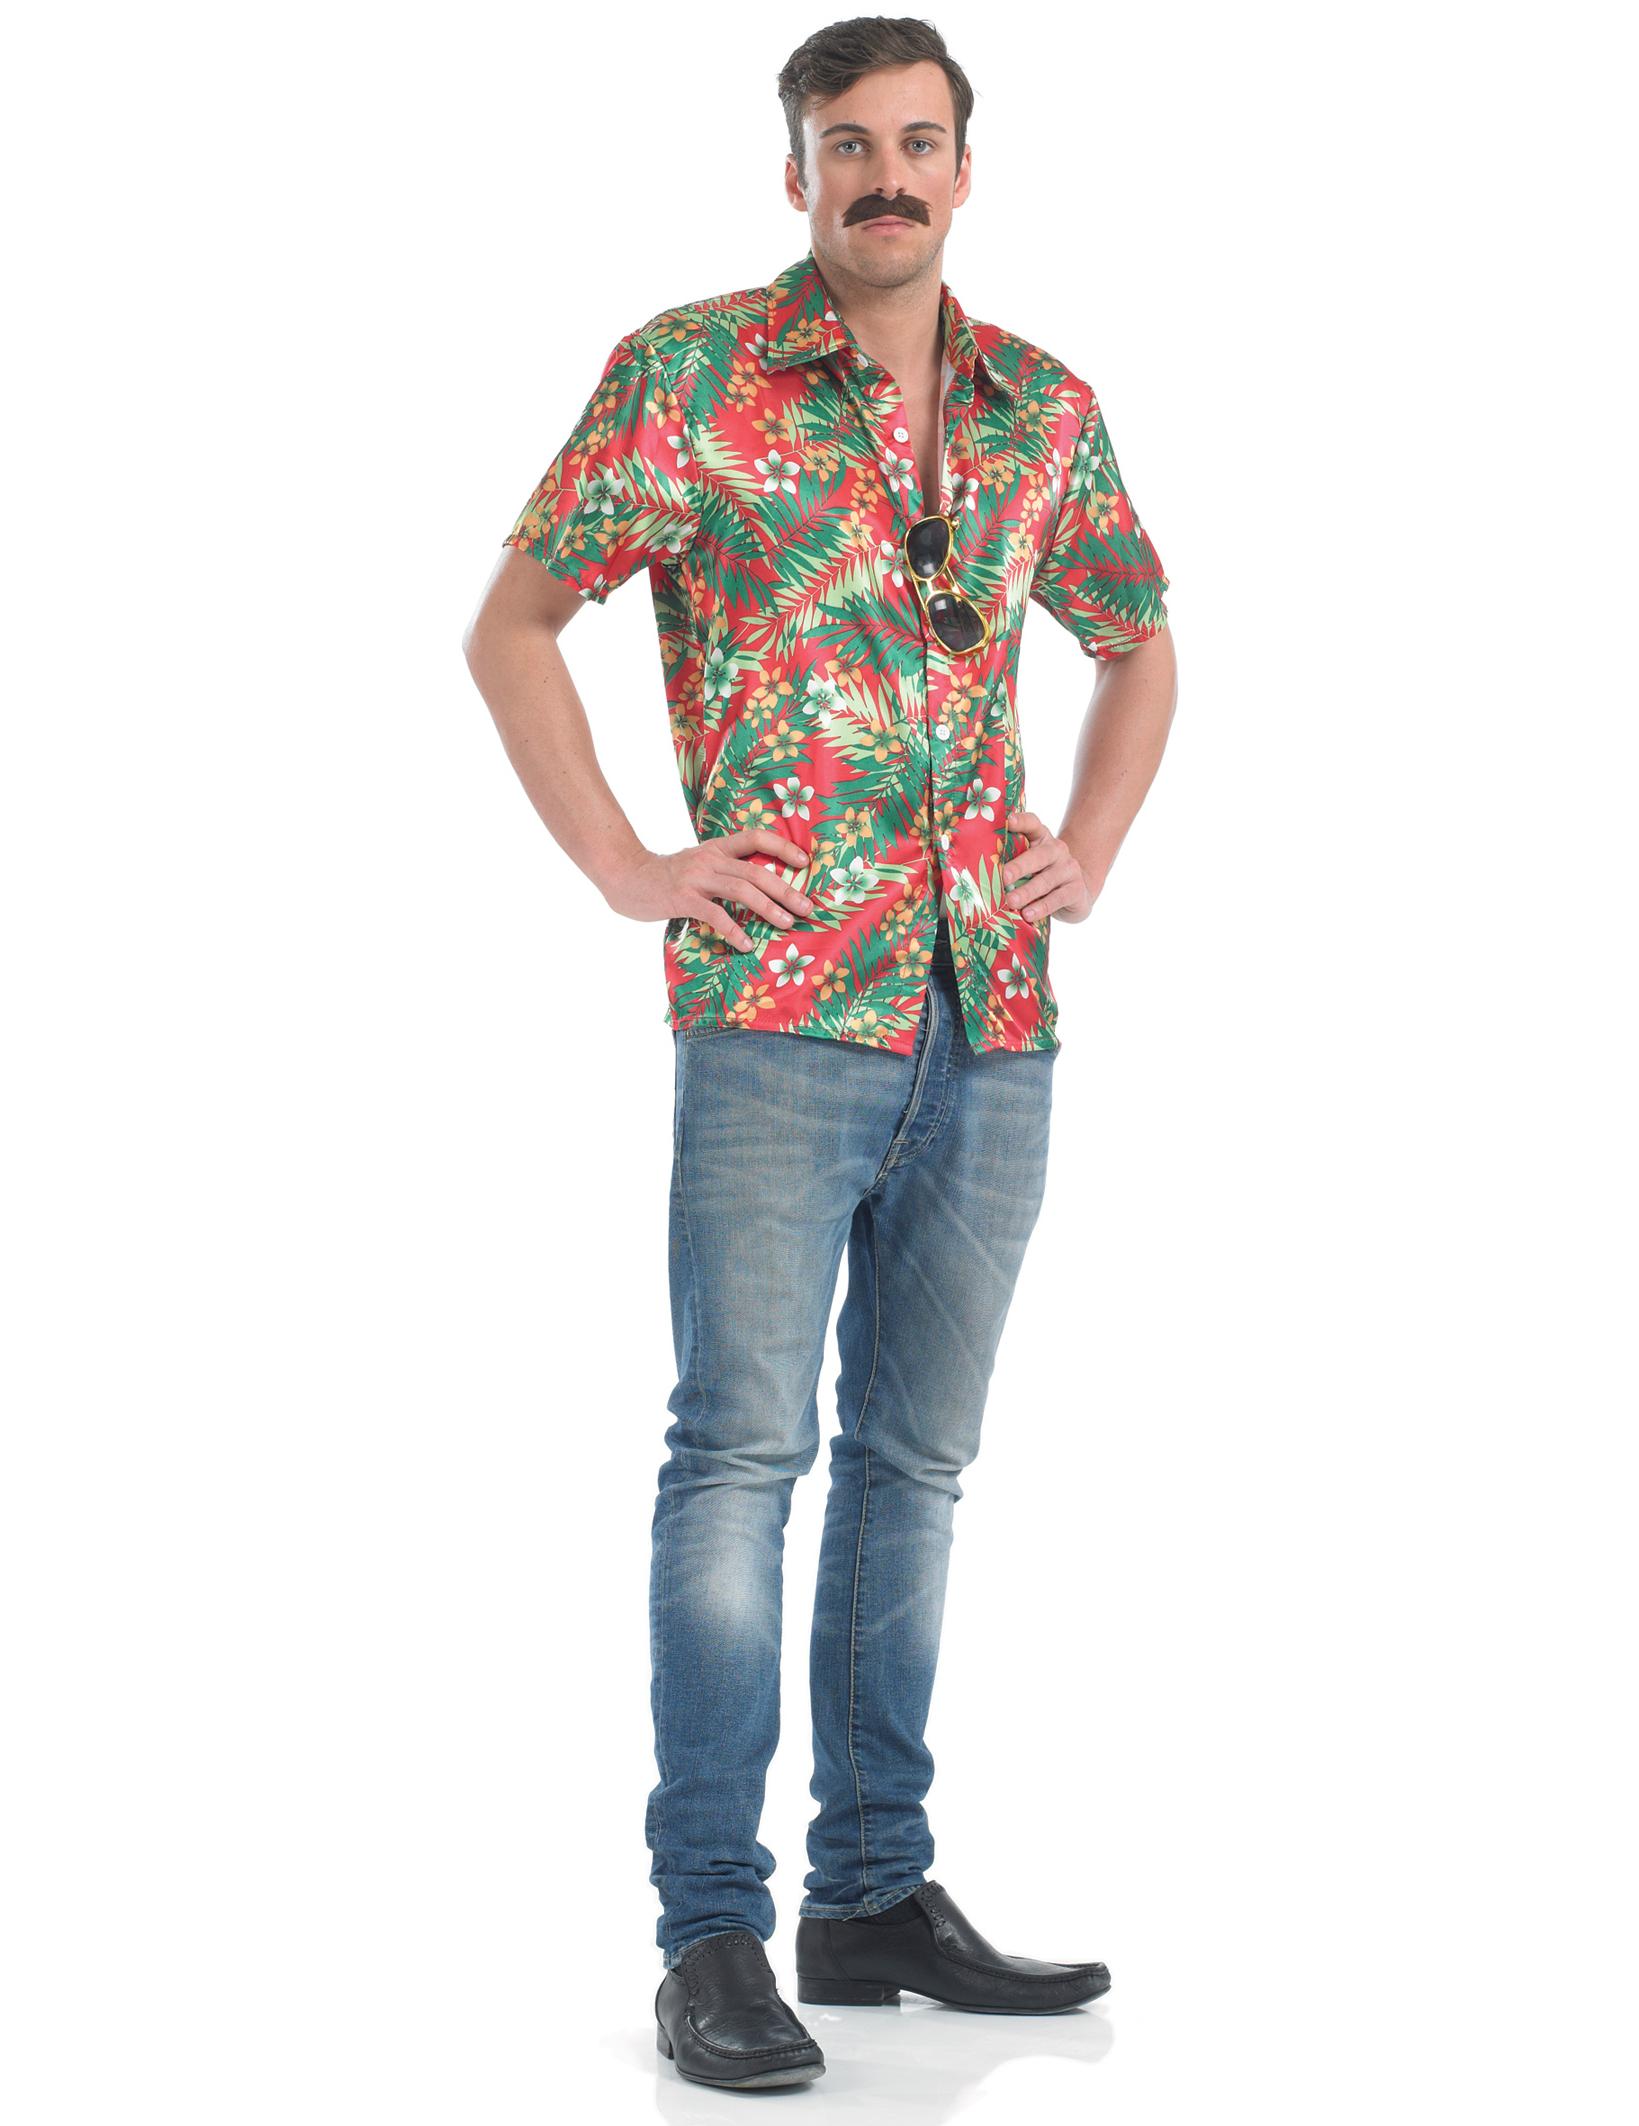 hawaii hemd f r erwachsene kost me f r erwachsene und g nstige faschingskost me vegaoo. Black Bedroom Furniture Sets. Home Design Ideas